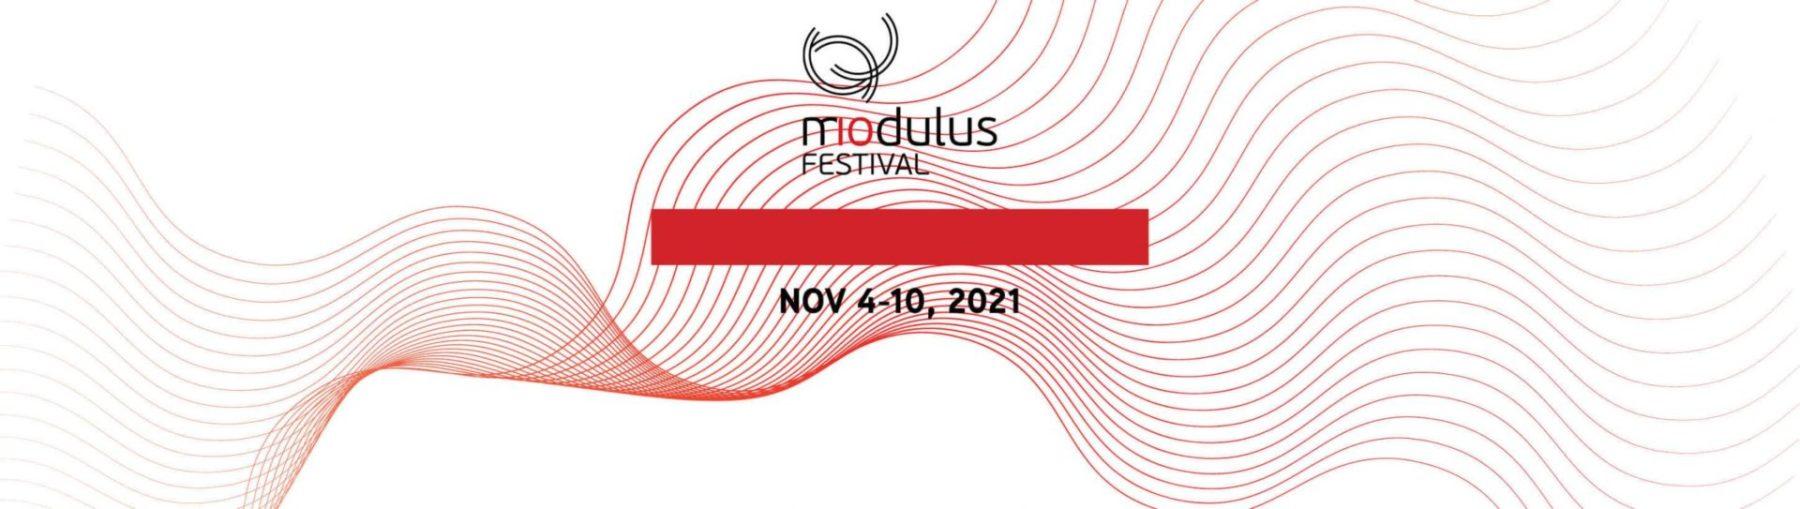 10th Modulus Festival